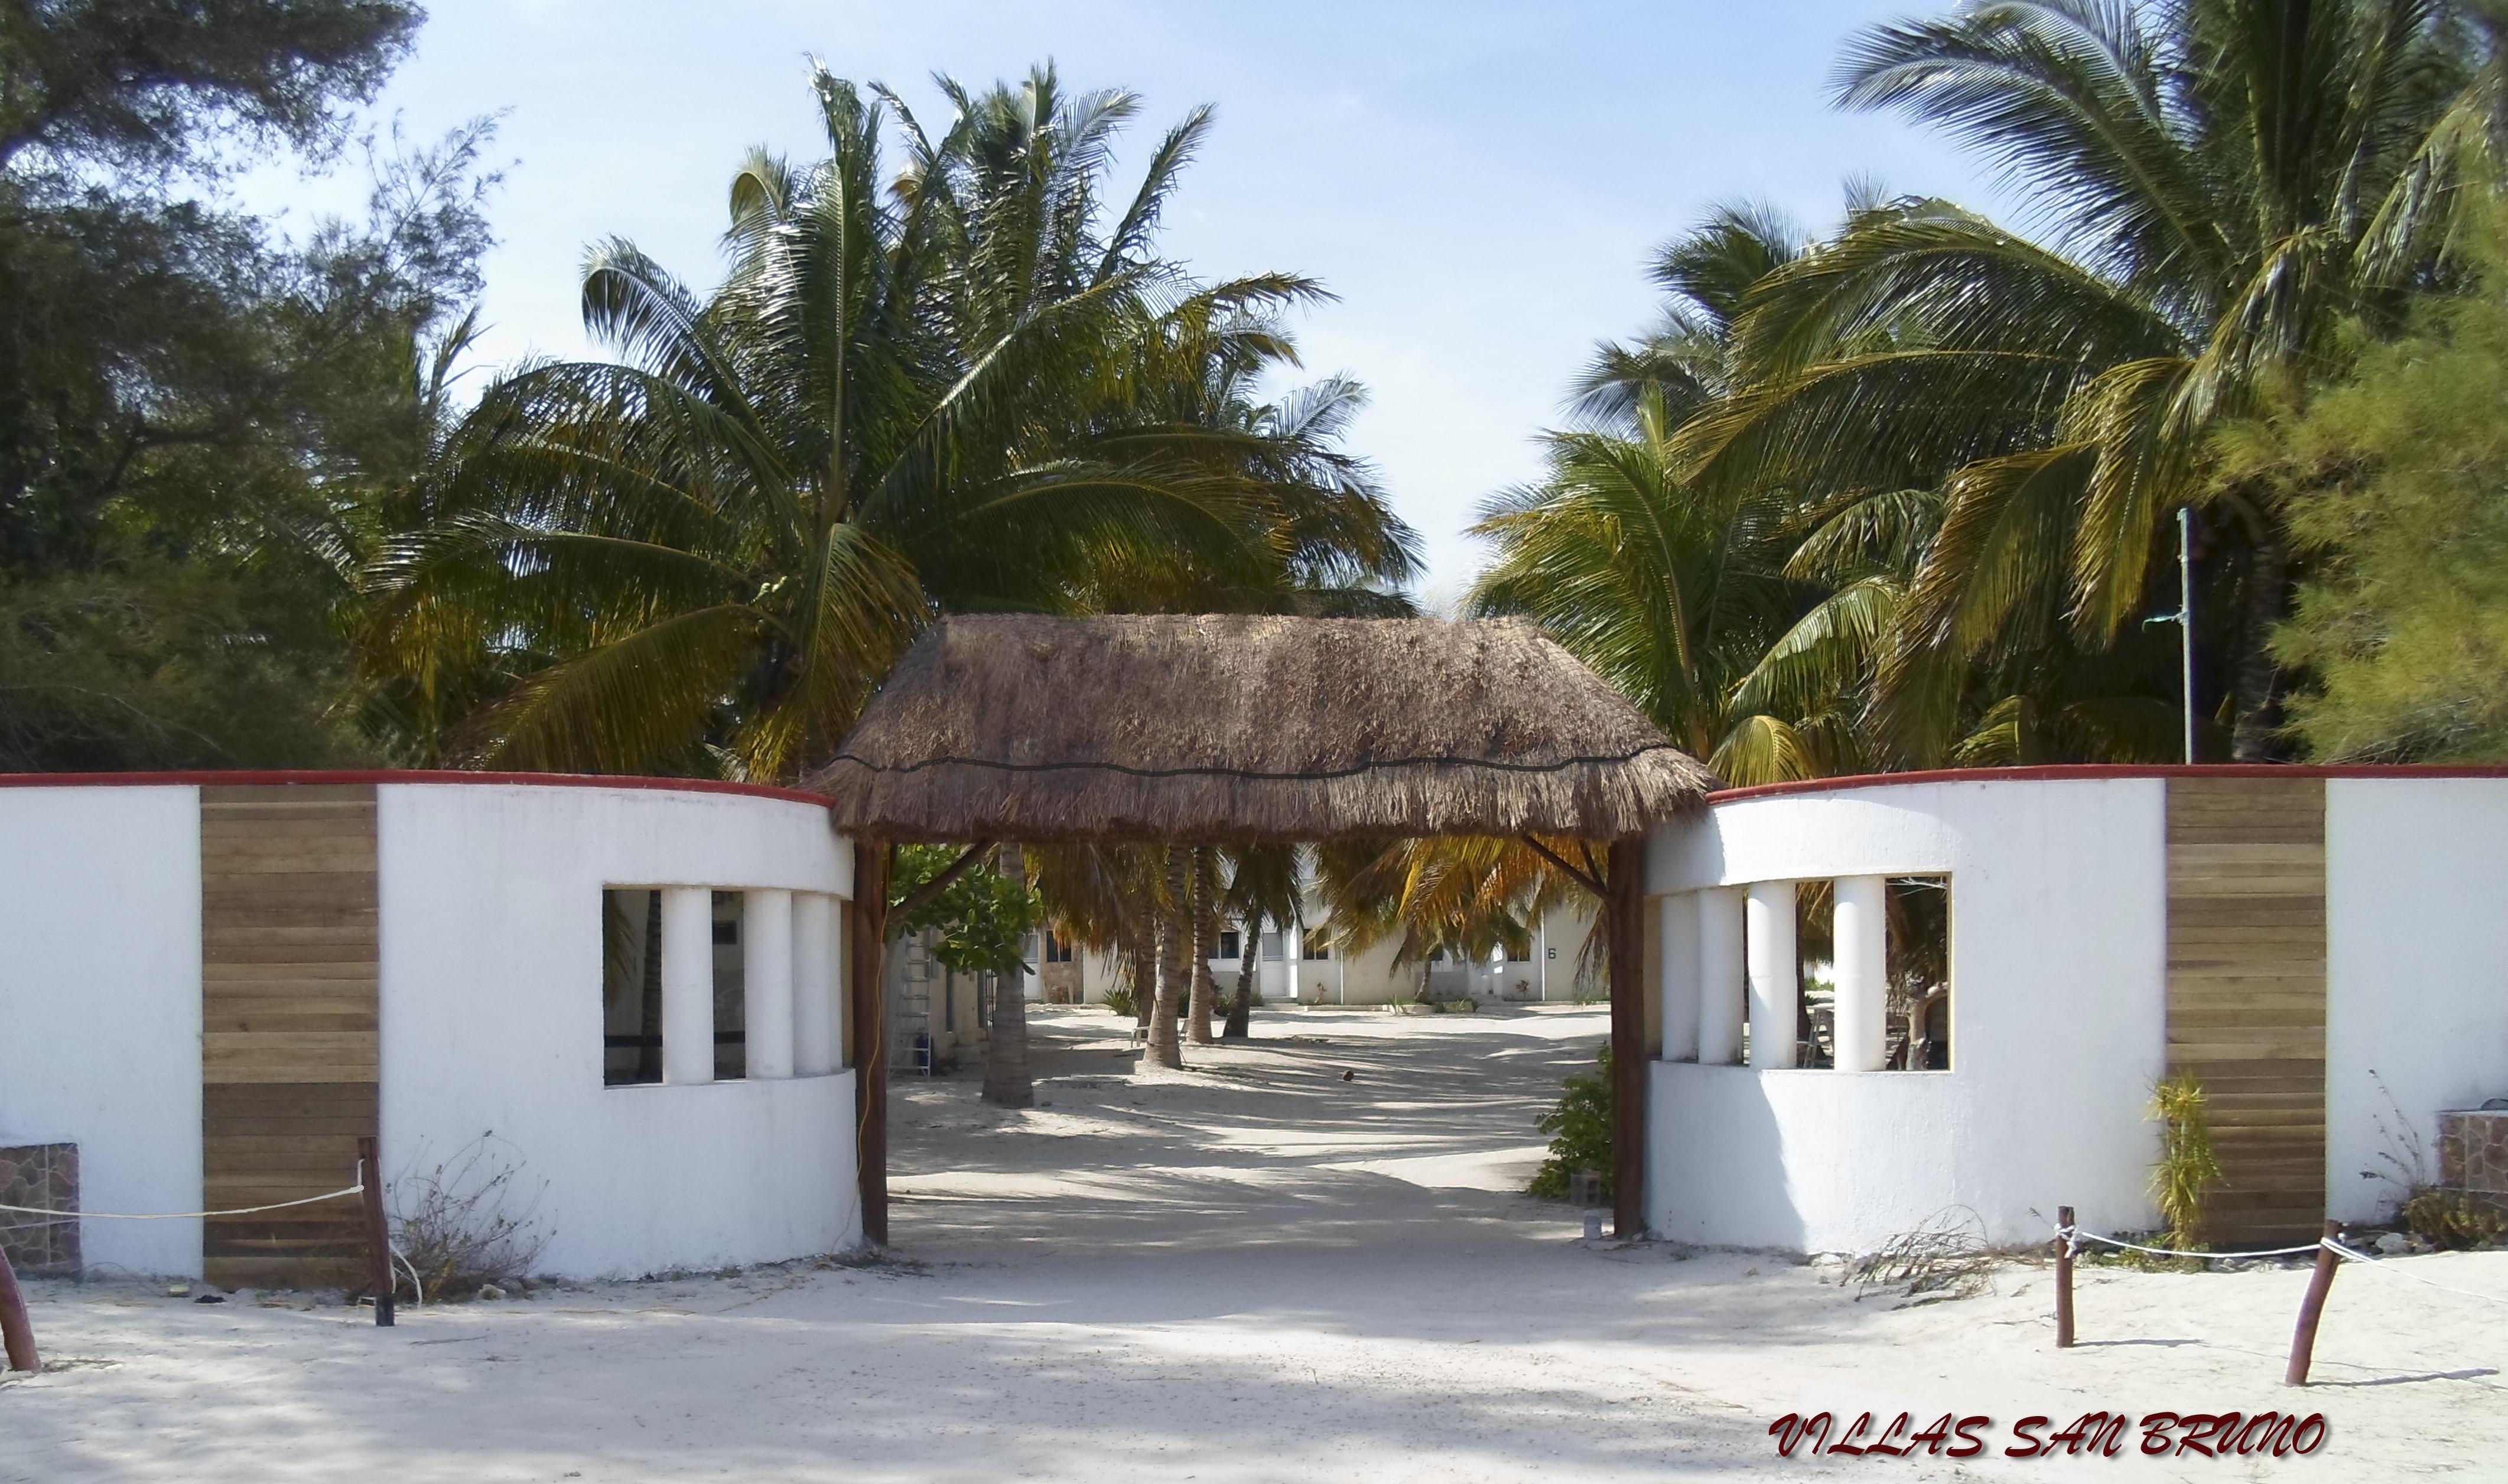 Grupodumex for Villas san bruno